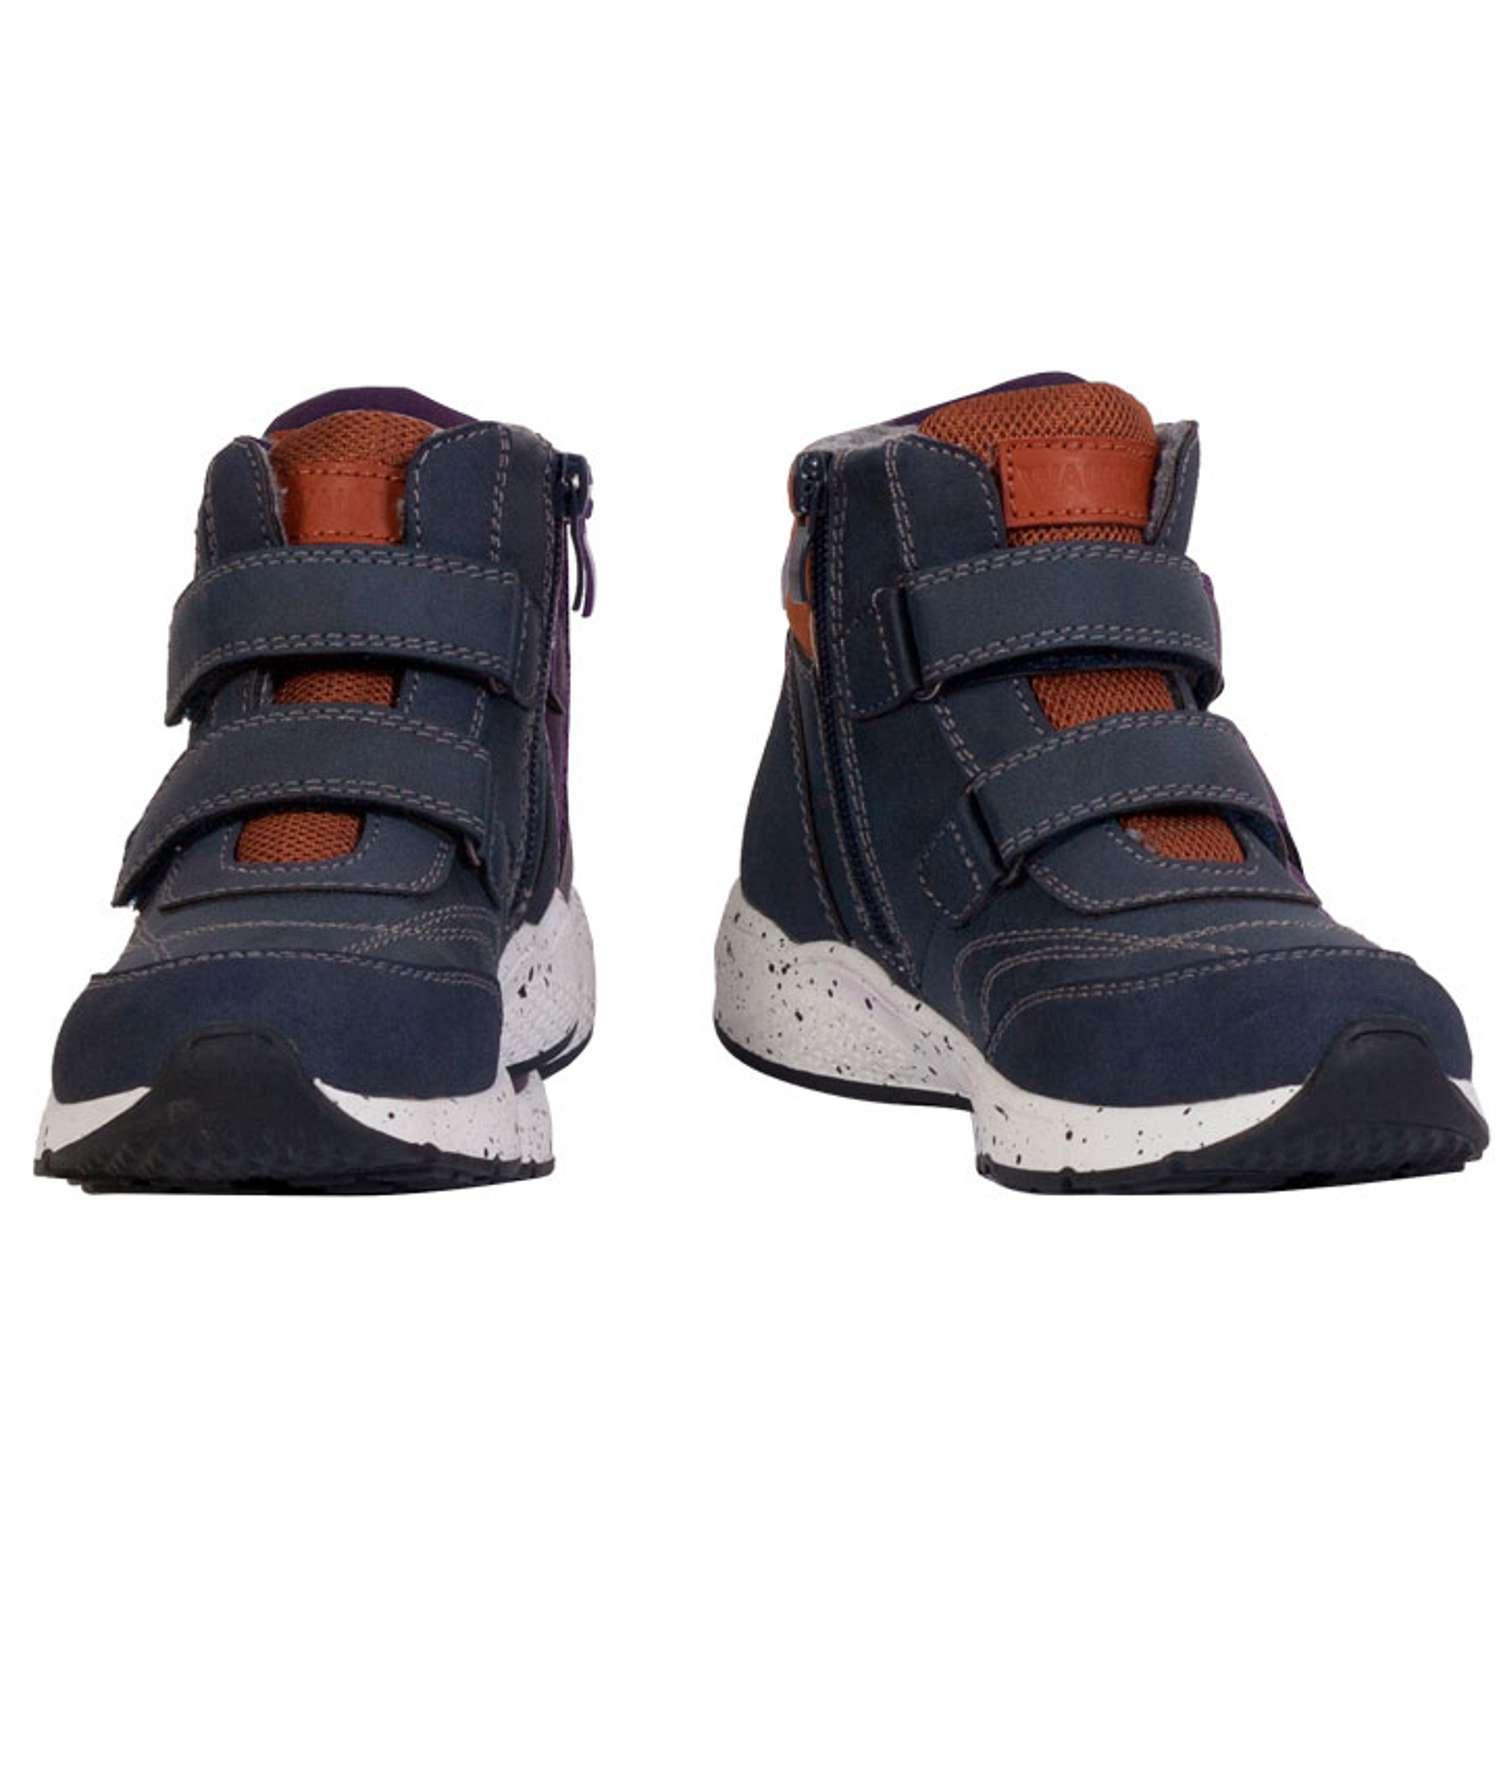 Walkway - Akako børne vinter sneakers - Mørkeblå - Størrelse 37